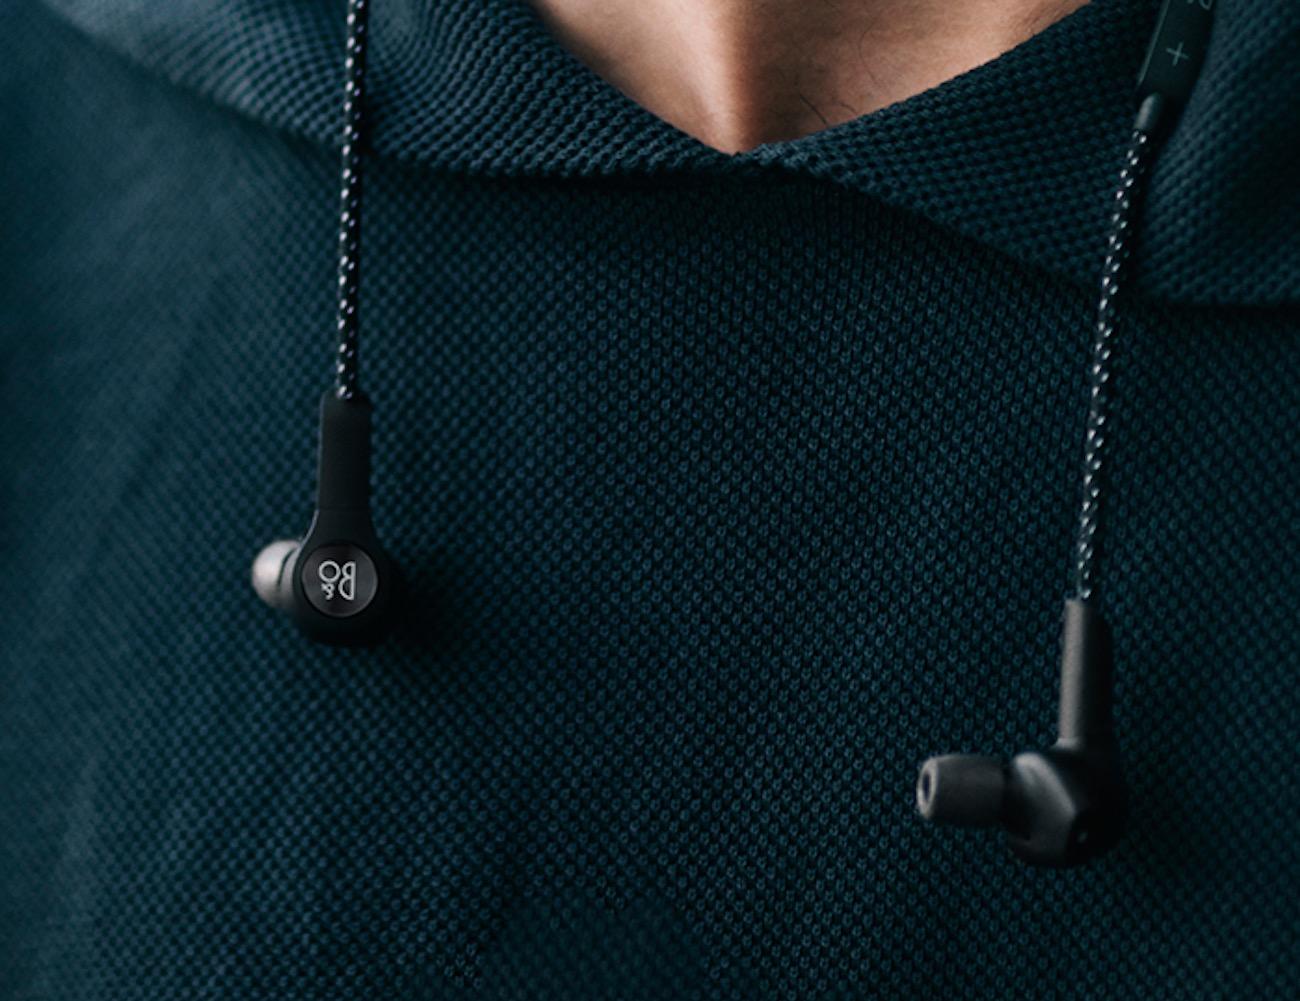 Beoplay H5 Wireless Earphones by Bang & Olufsen